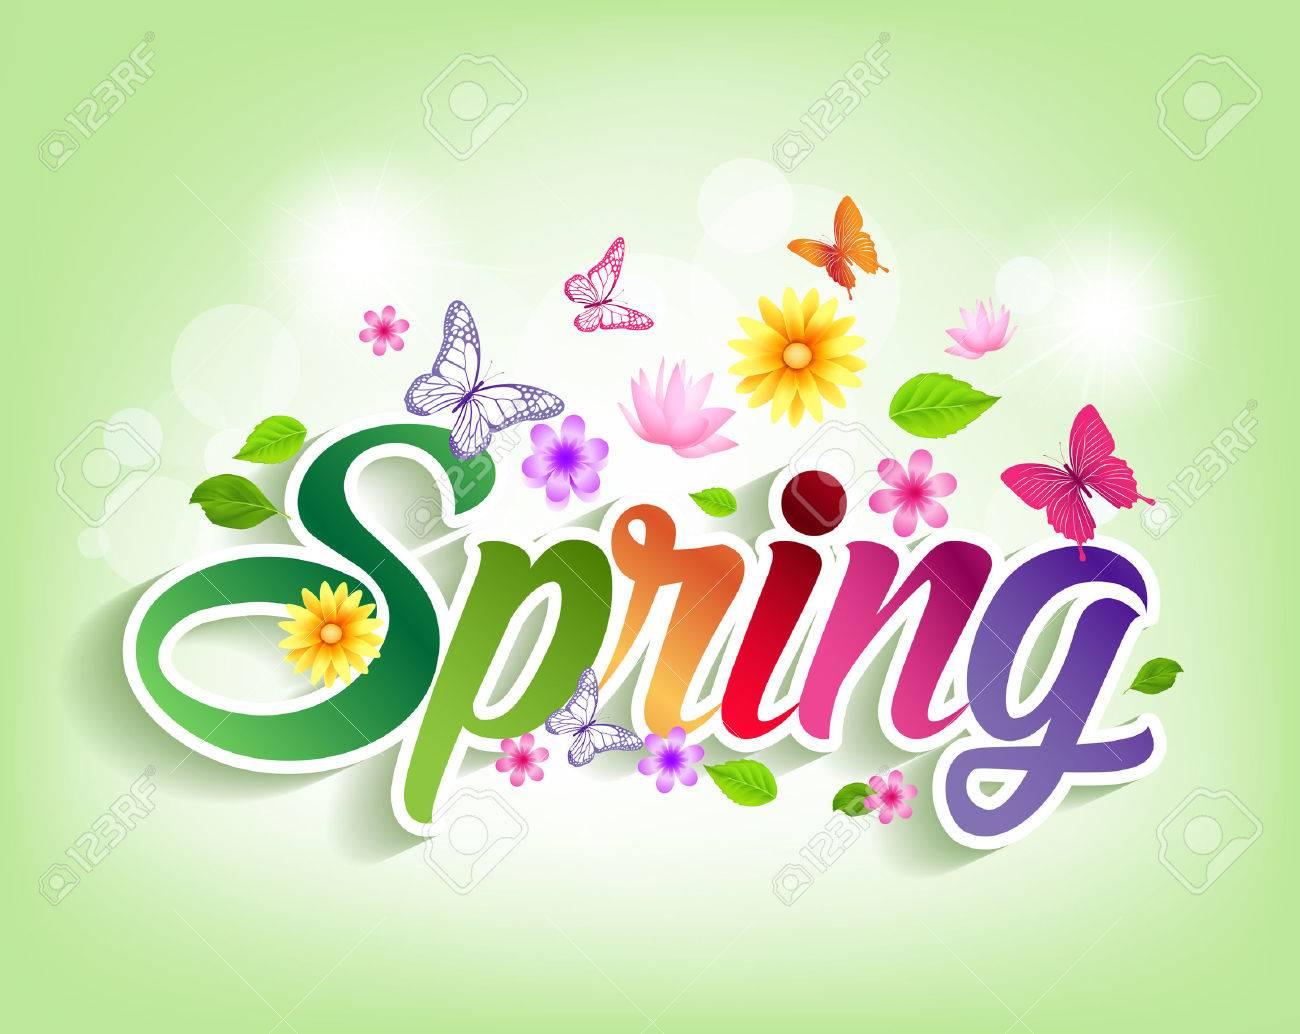 spring word paper cut with flowers u0026 butterflies vector